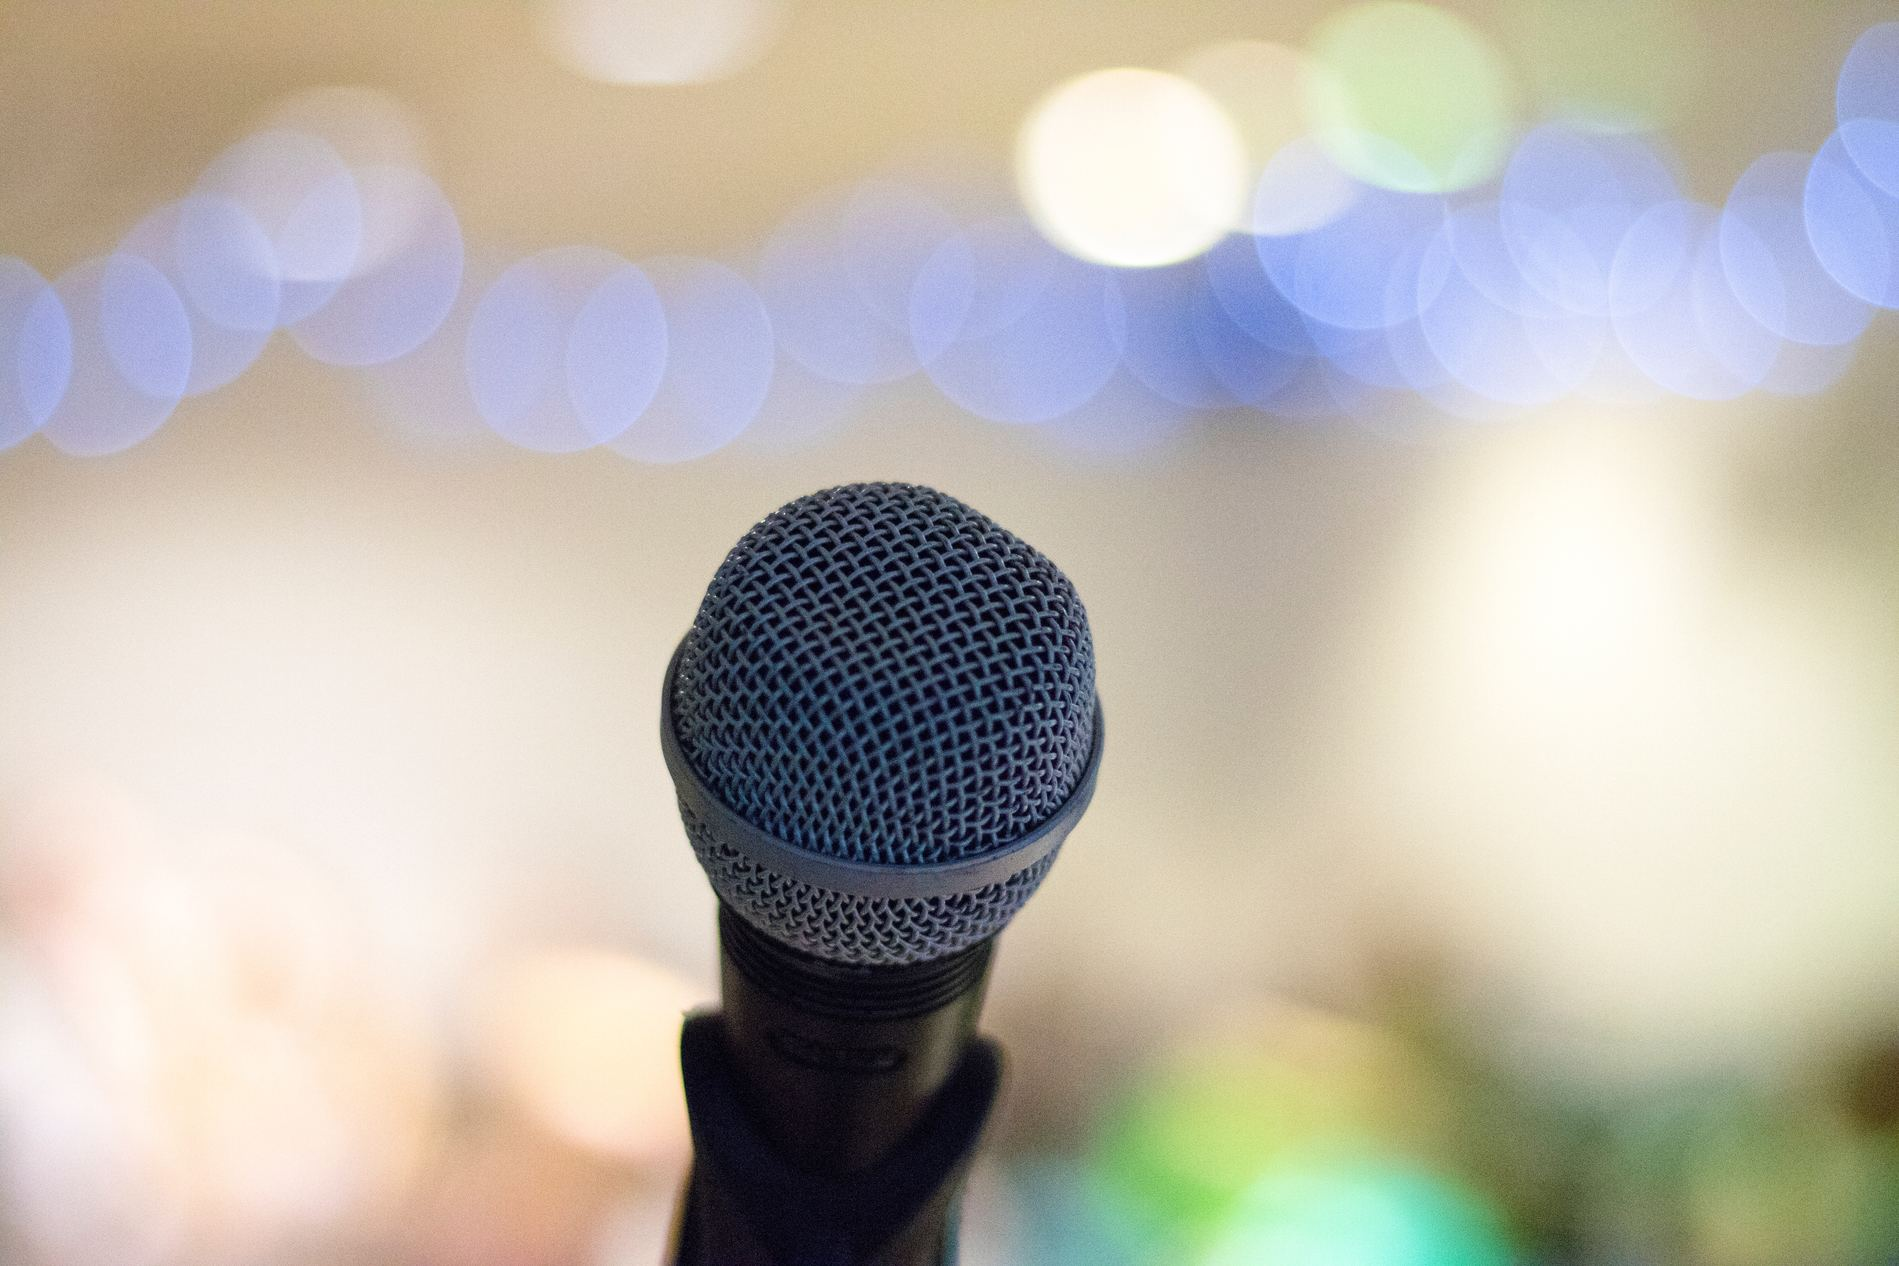 möblum-festivales_musicales-microfono-luces